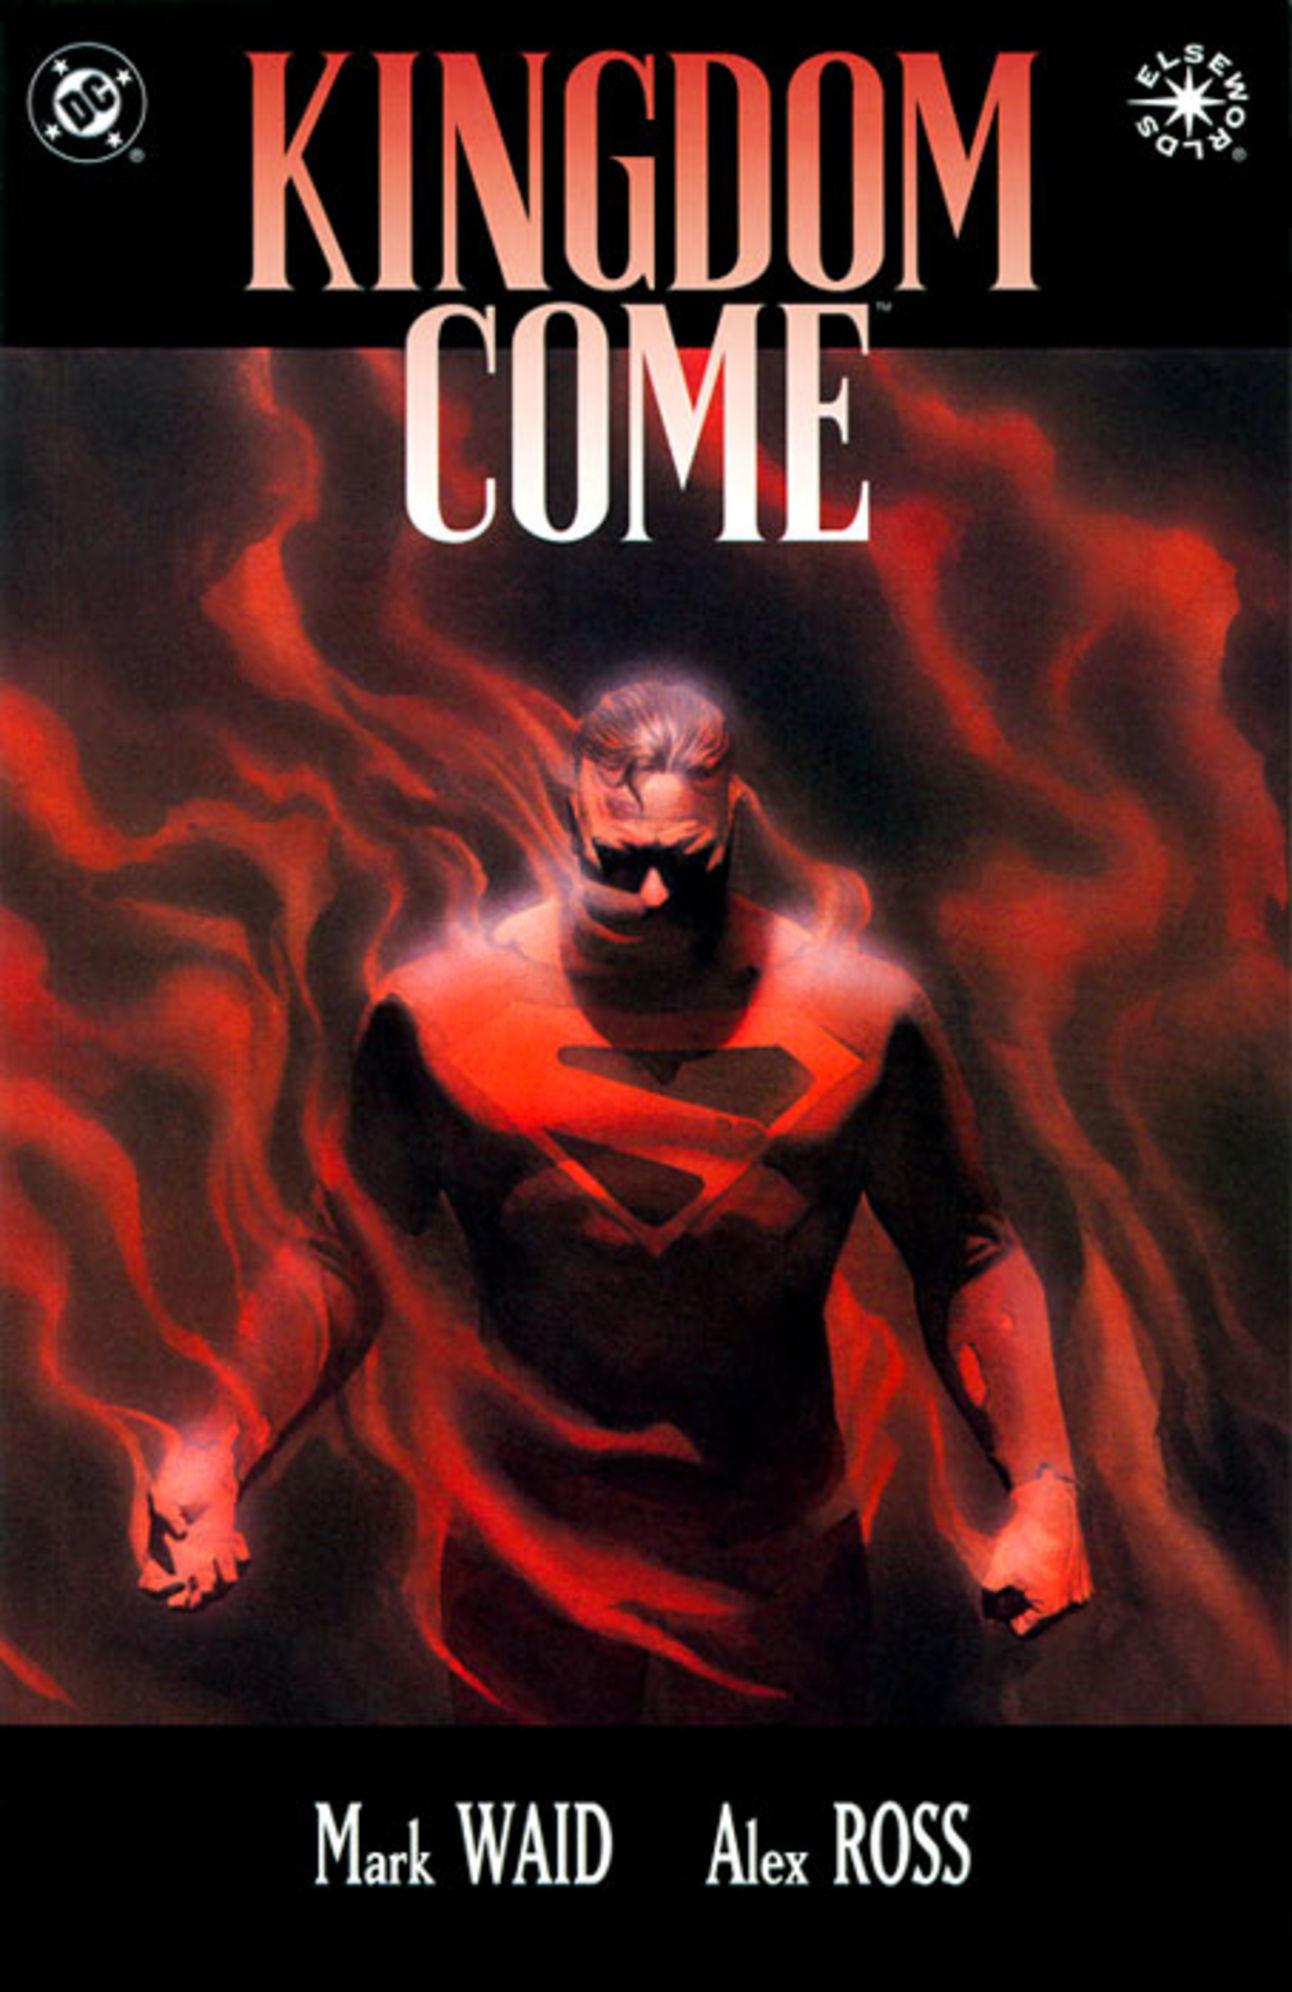 1996-kingdom-come-4.jpg